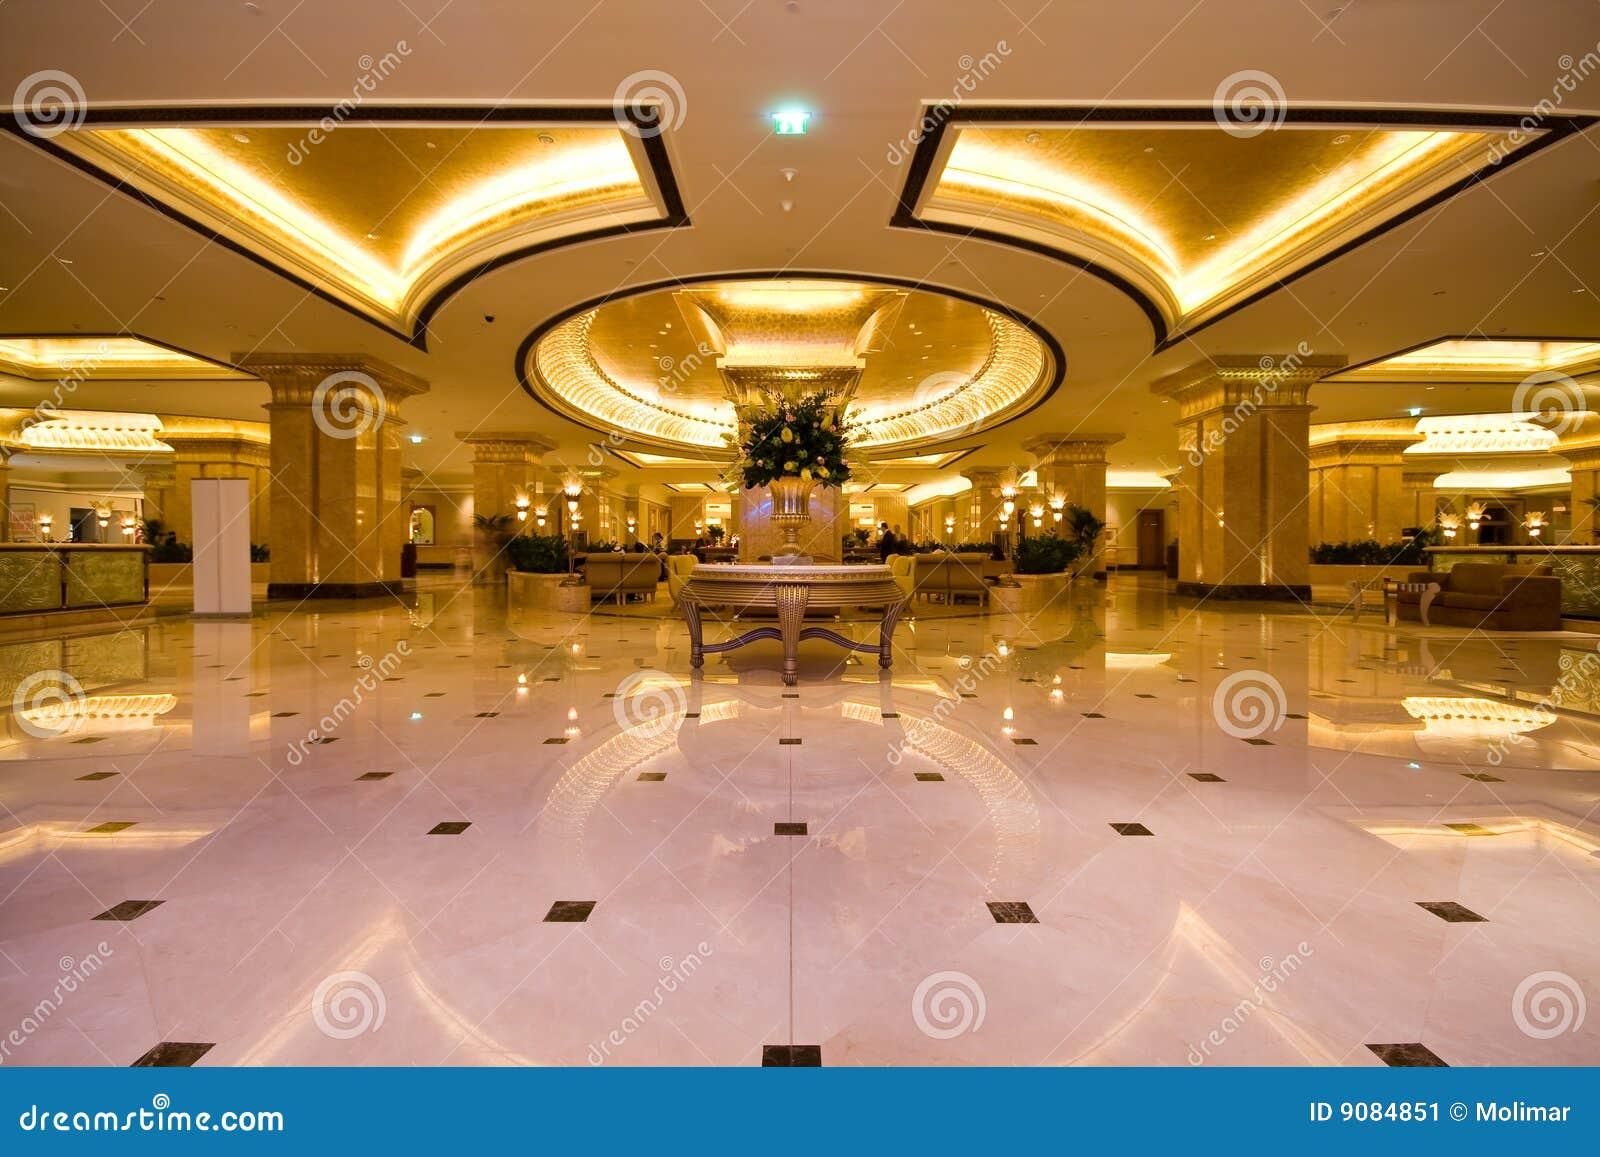 hotel lobby floor plan images modern hotel lobby design black and emirates palace hotel lobby stock image image 9084851